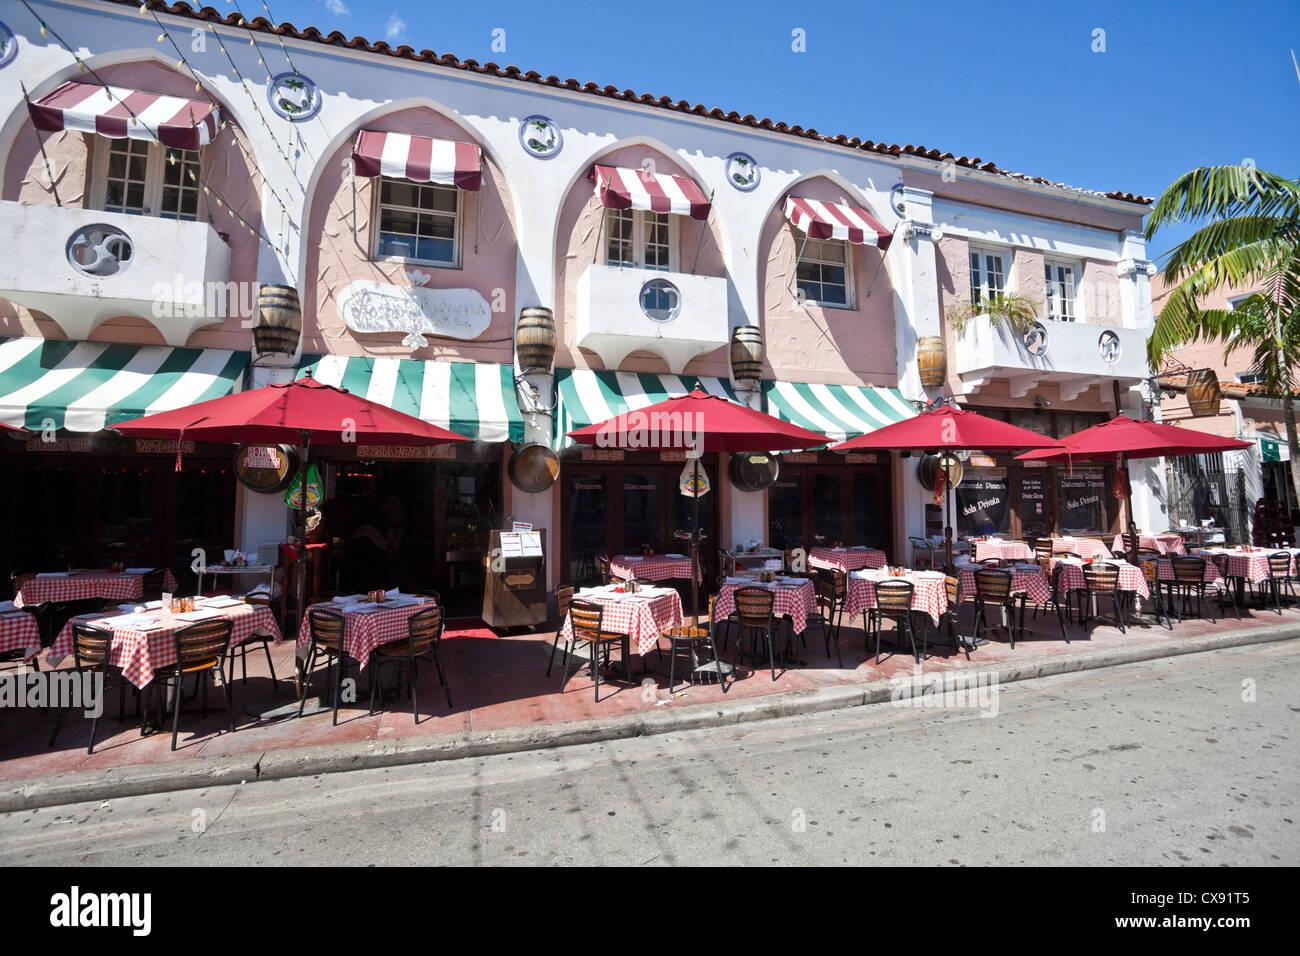 Restaurant Espanola Way Usa Stockfotos & Restaurant Espanola Way Usa ...